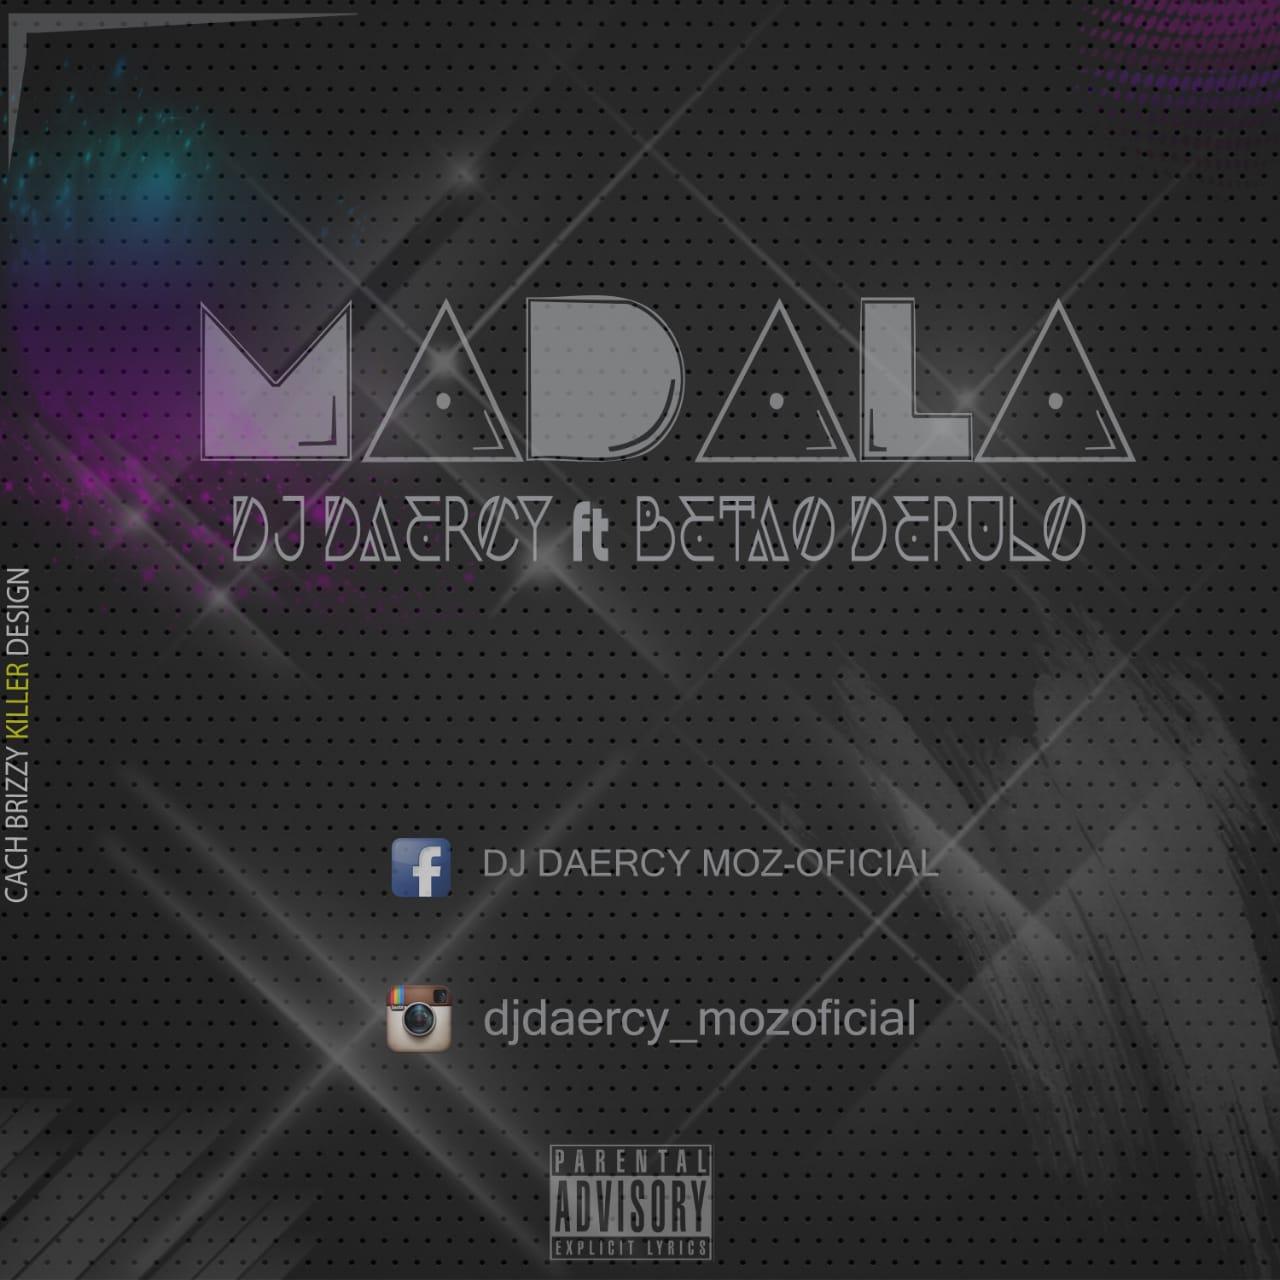 Post Malone Better Now Baixar Mp3: Dj Daercy - Madala (feat. Betão Derulo) 2018